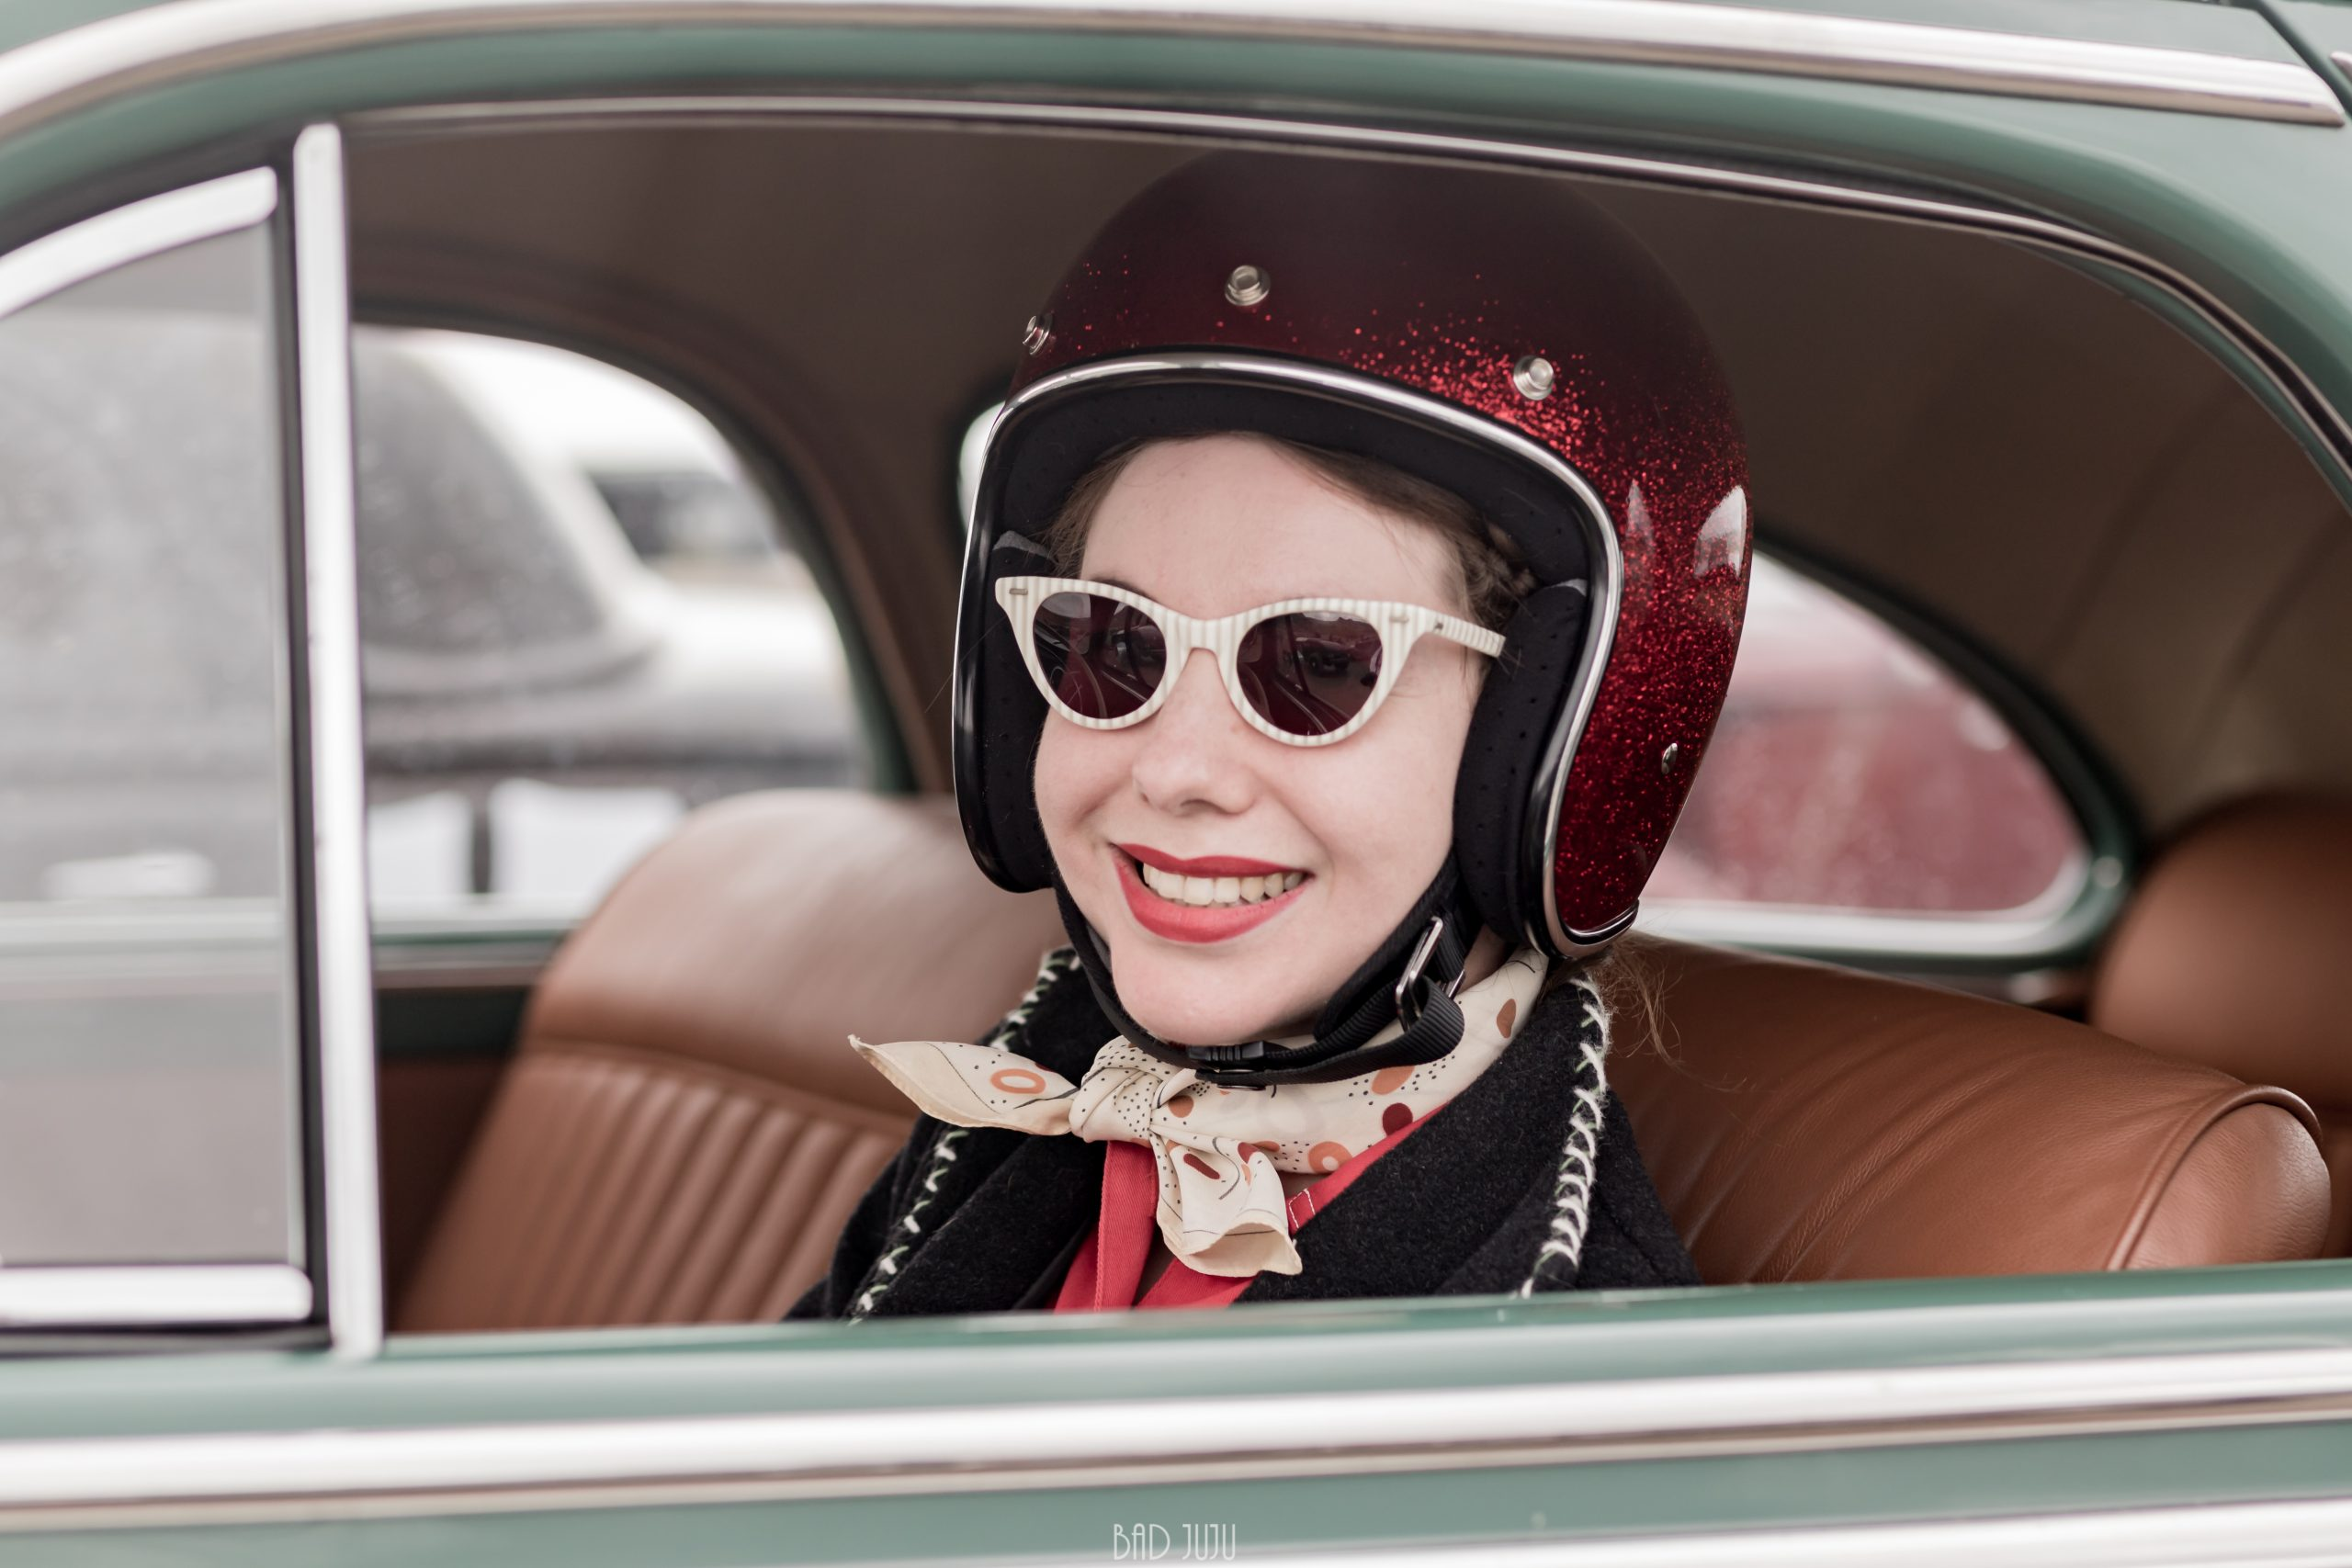 Pendine Sands driver behind wheel portrait